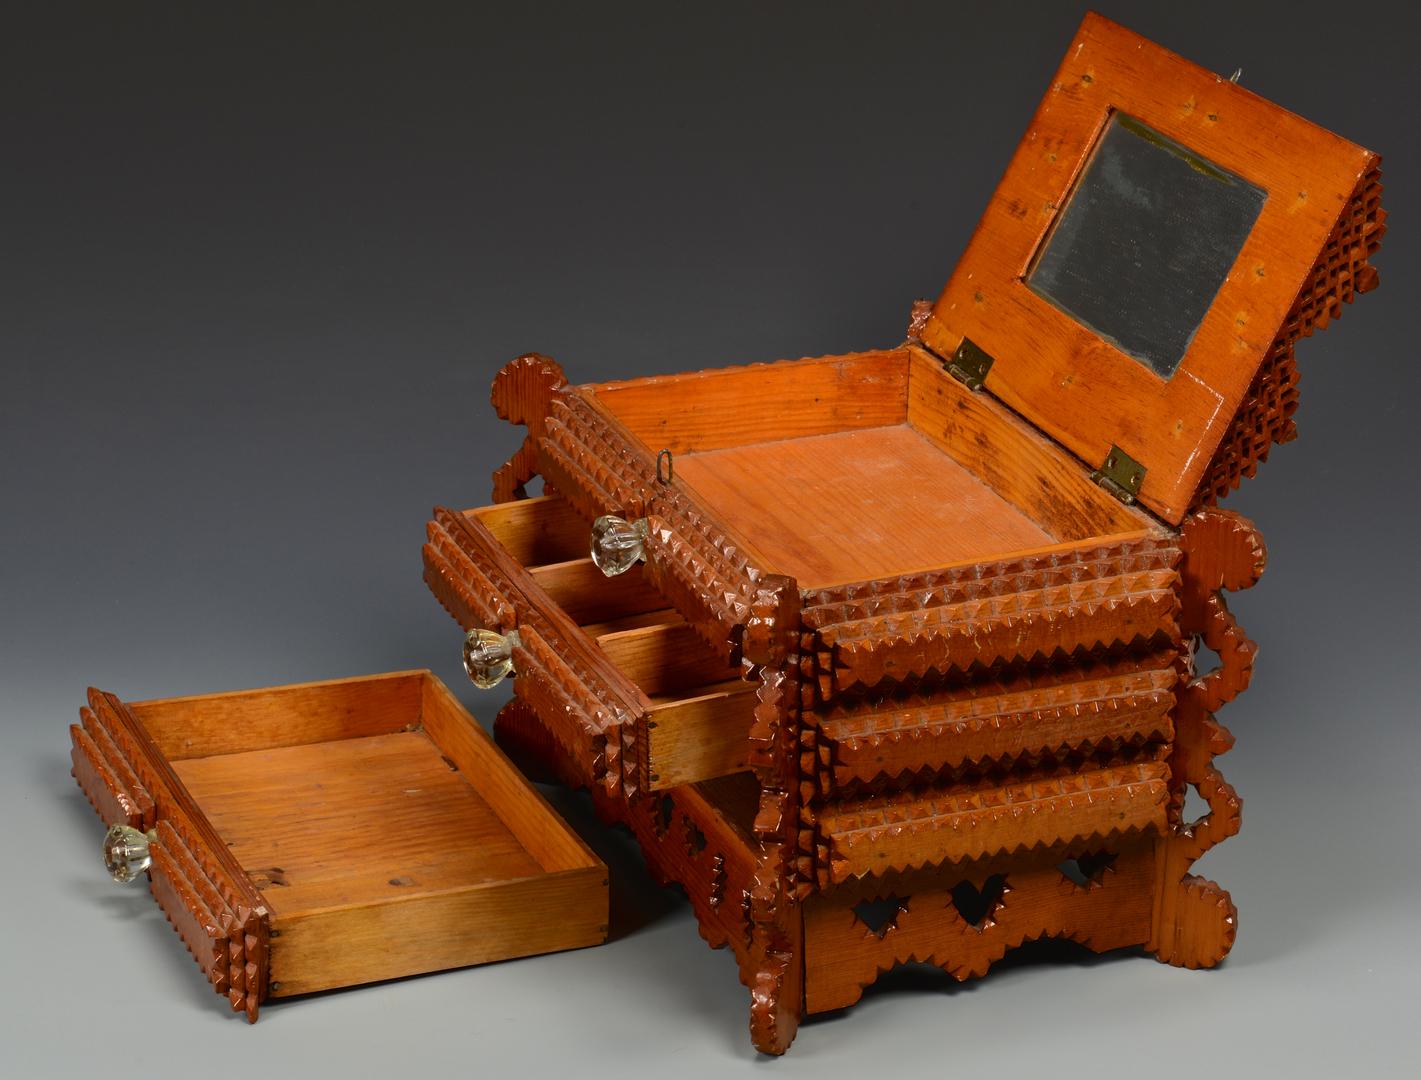 Lot 698: Large Tramp Art Sewing Box